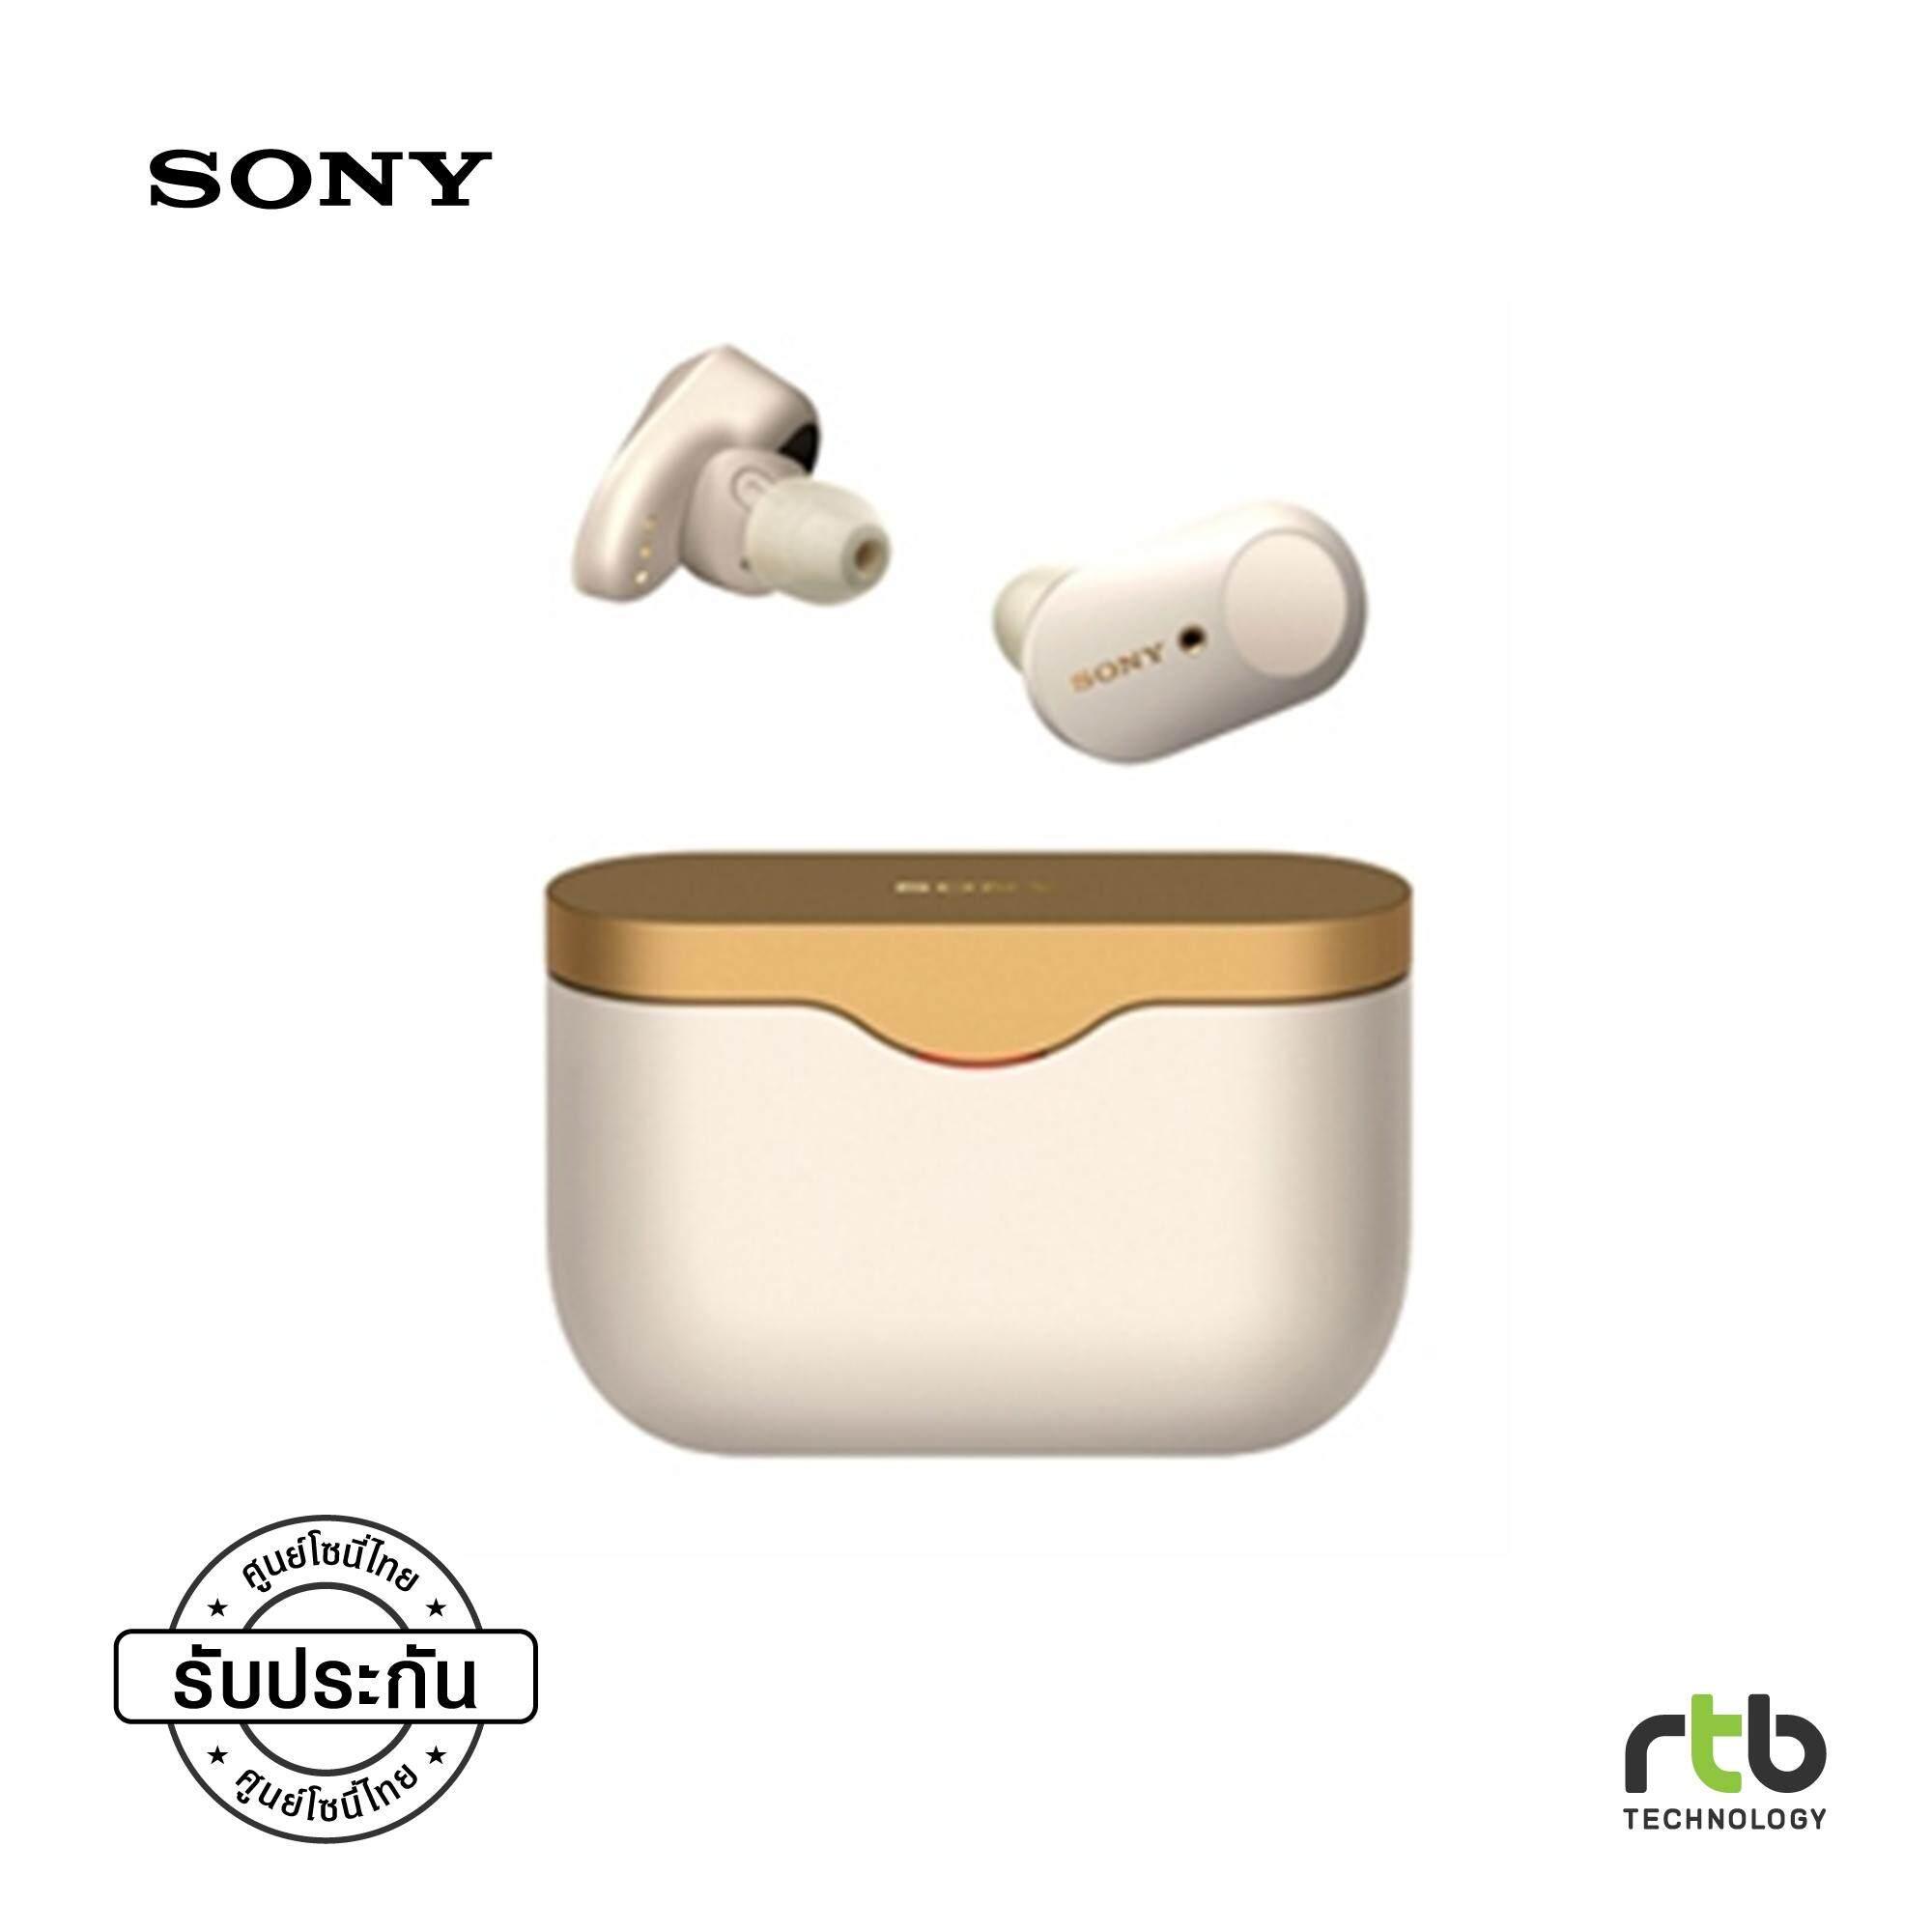 (Pre Order แถม Power Bank Sony ส่งสินค้าวันที่ 24 ก.ค.62) Sony หูฟัง ไร้สาย ตัดเสียงรบกวน รุ่น WF 1000XM3 - Silver รีวิว sony wf-1000xm3 หูฟังไร้สาย true wireless ที่ครบเครื่องในการใช้งานประจำวัน - รีวิว Sony WF-1000XM3 หูฟังไร้สาย True Wireless ตัดเสียงเงียกริบ ครบเครื่องสุดๆ ในการใช้งานประจำวัน